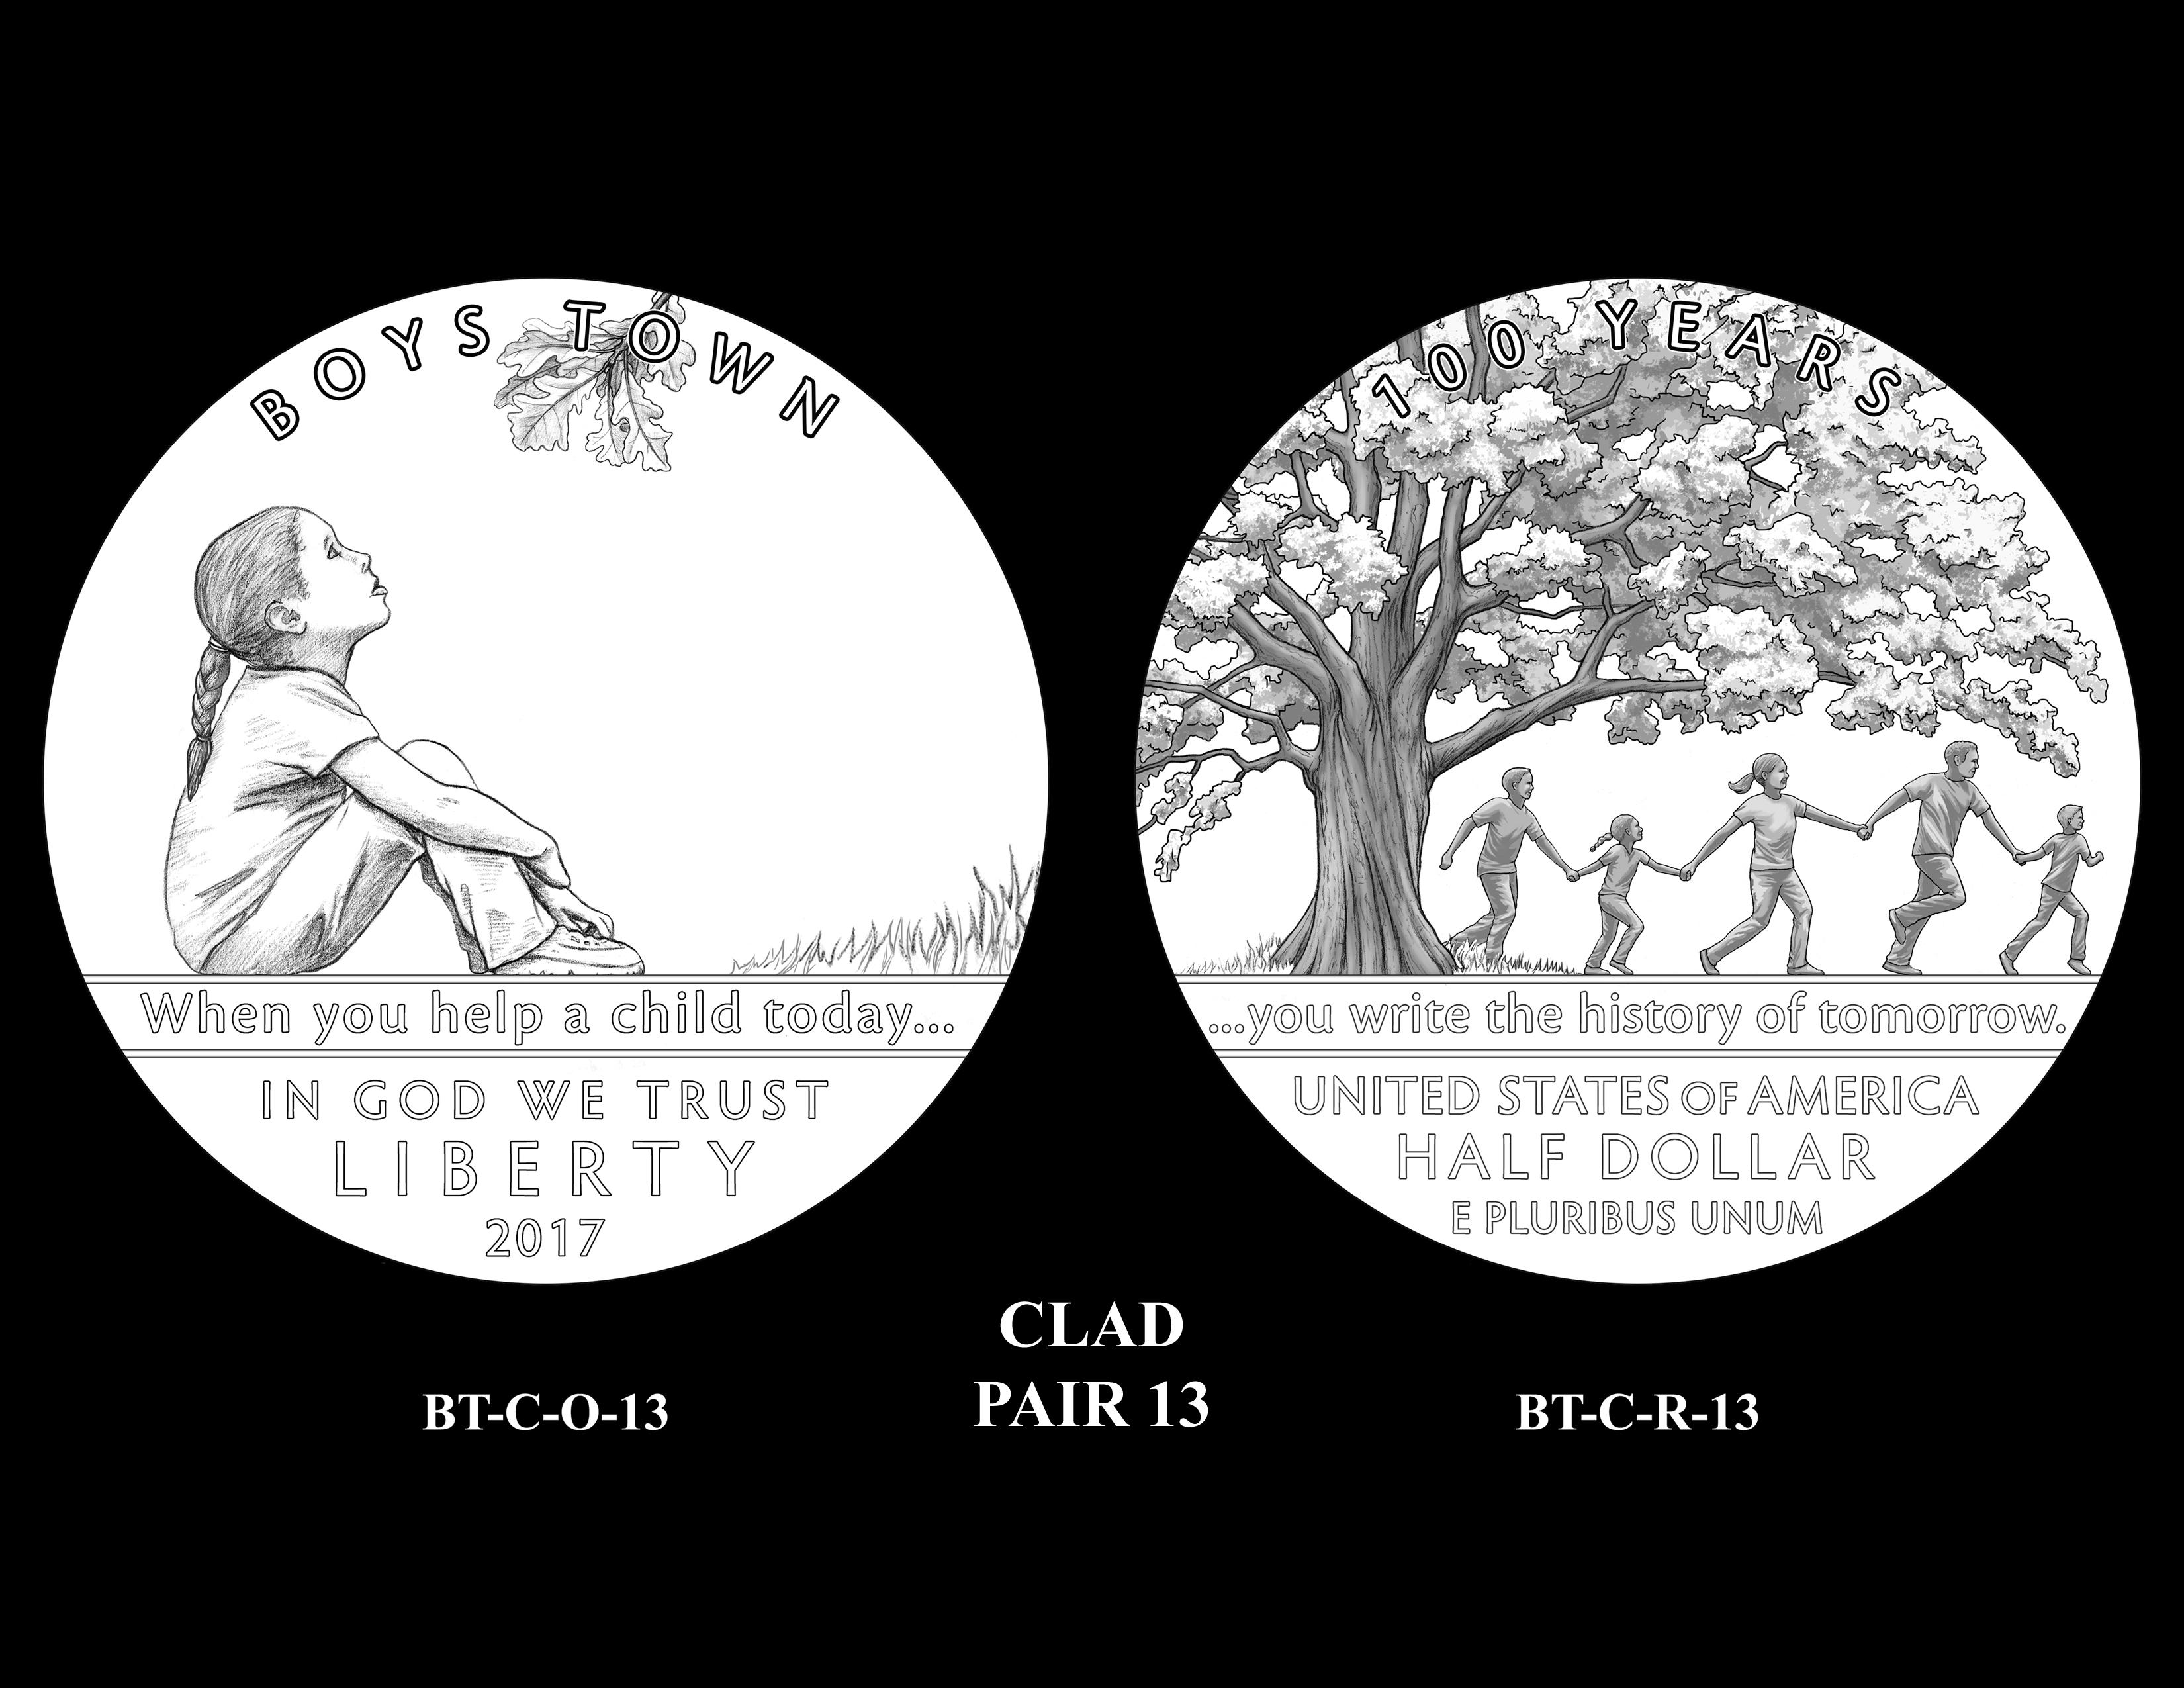 Clad-Pair-13 -- 2017 Boystown Centennial Commemorative Coin  Program